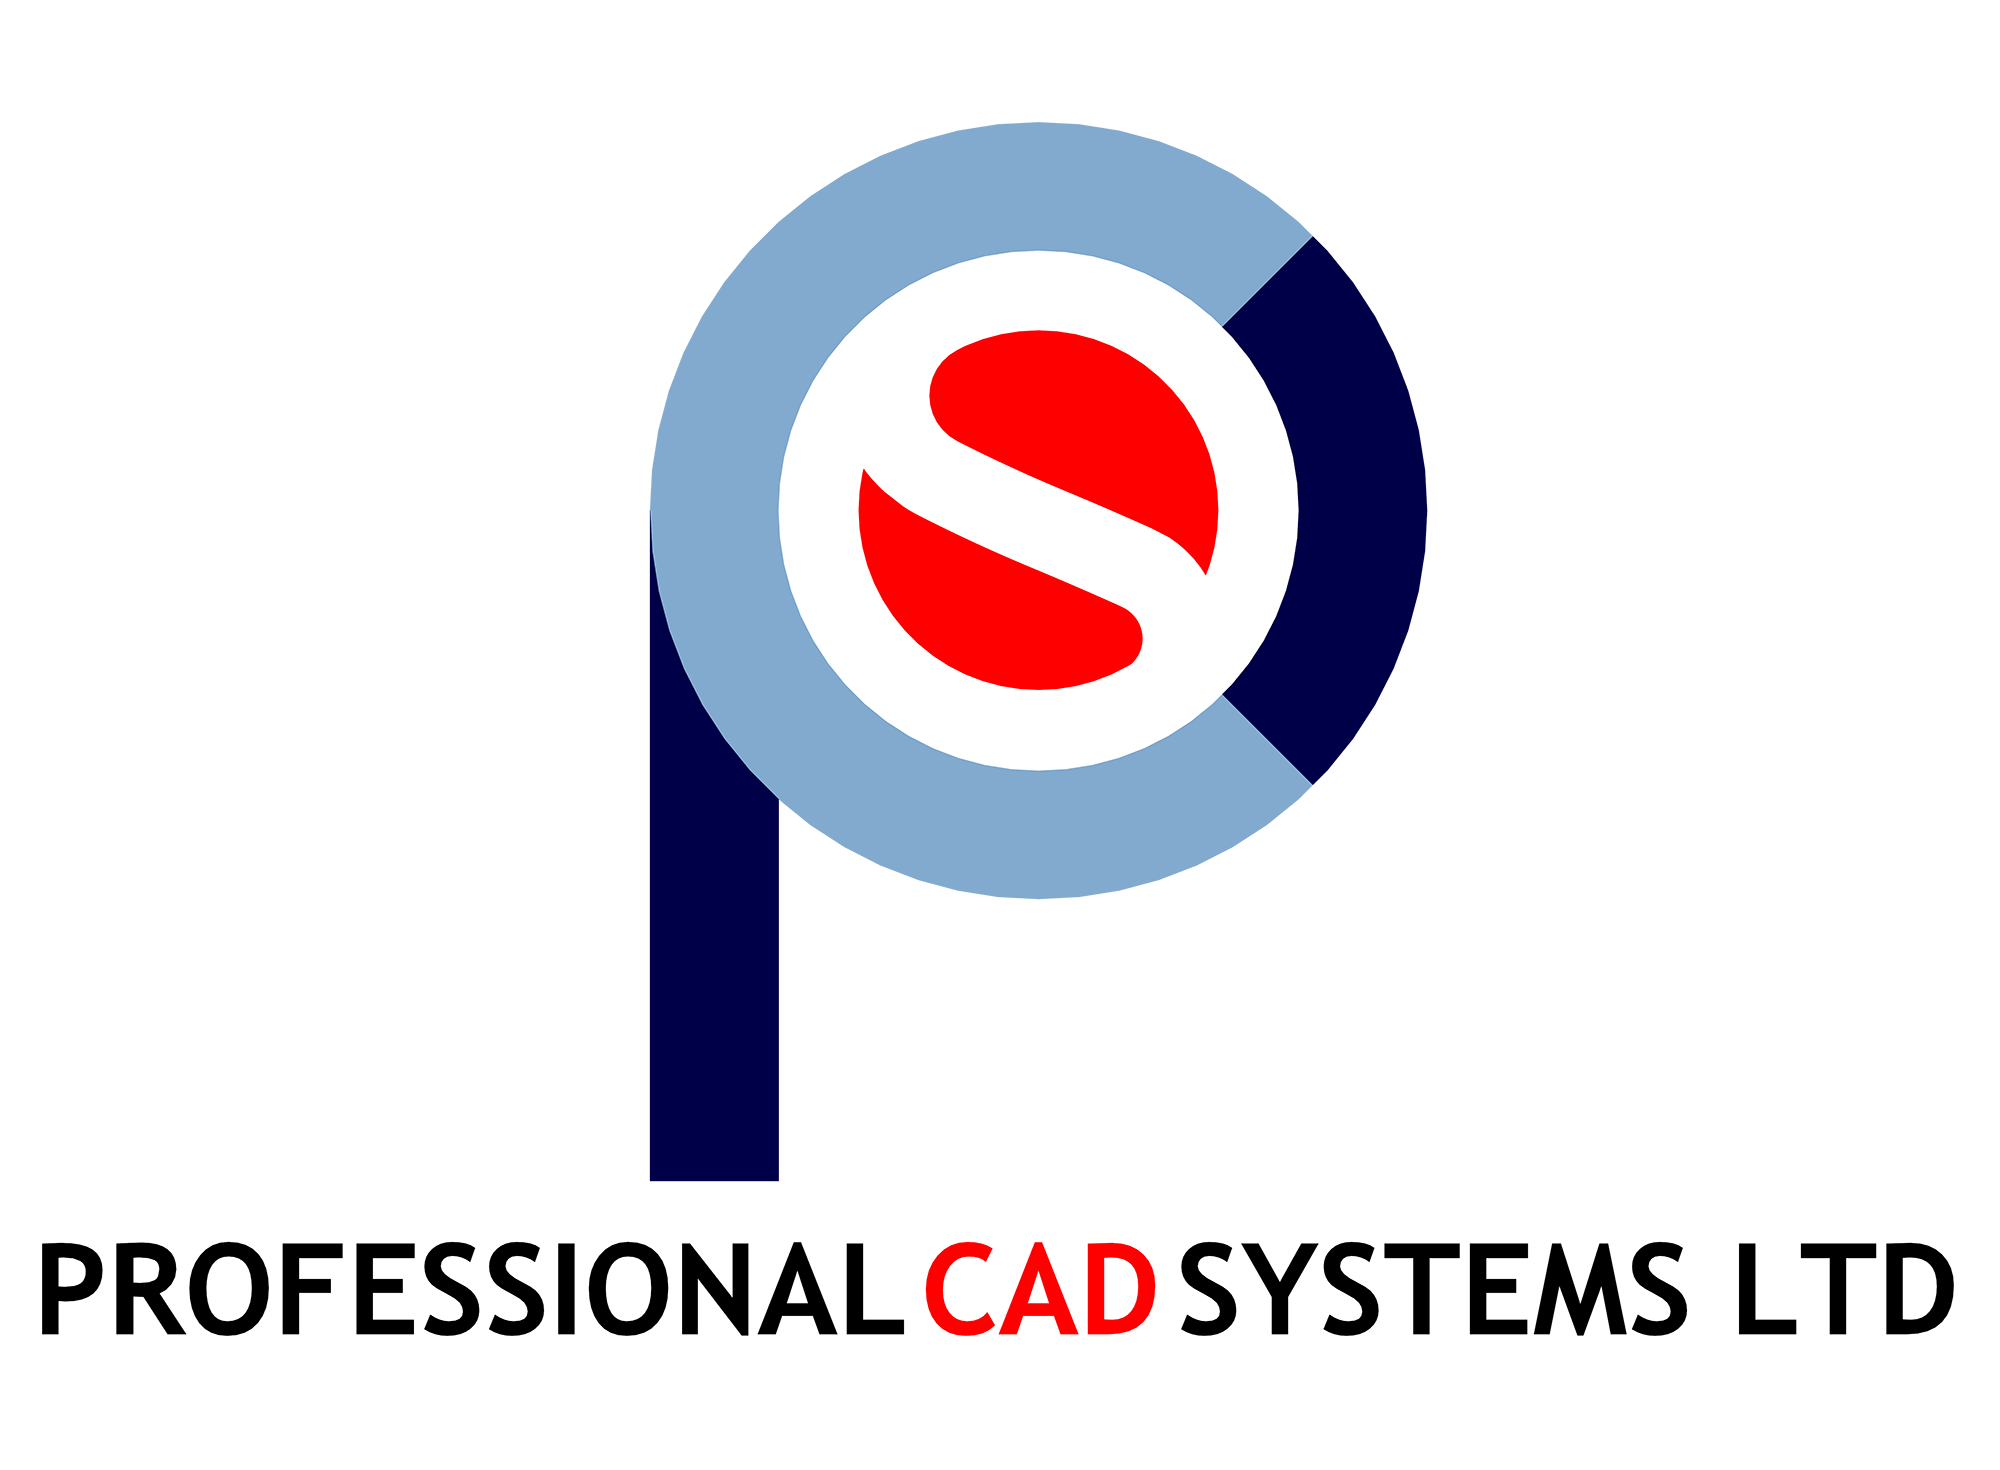 Professional CAD Systems Ltd